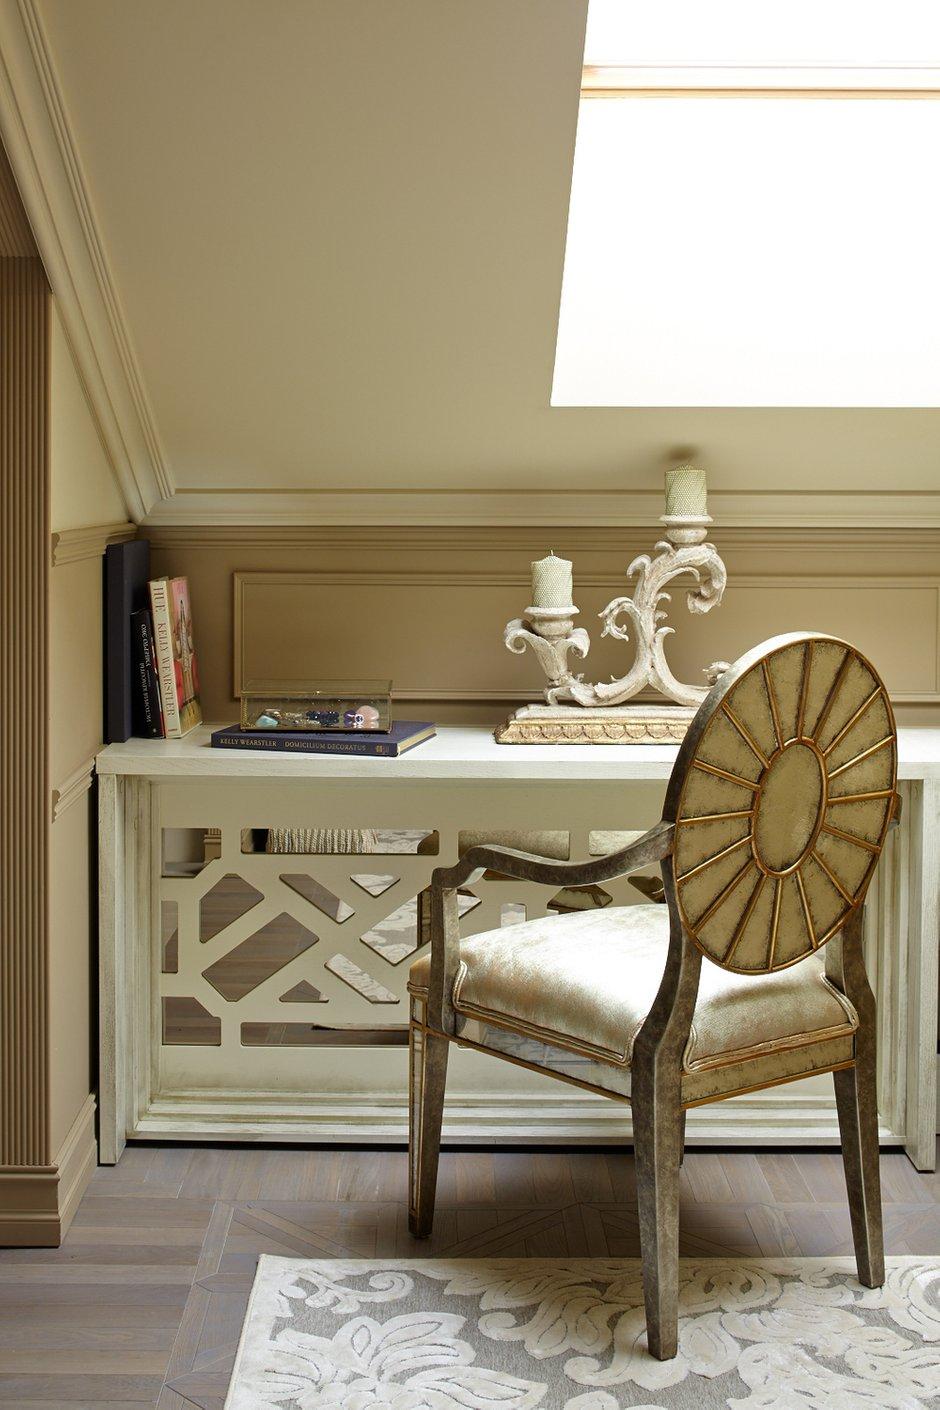 Фотография: Офис в стиле , Классический, Эклектика, Квартира, Текстиль, Дома и квартиры – фото на INMYROOM